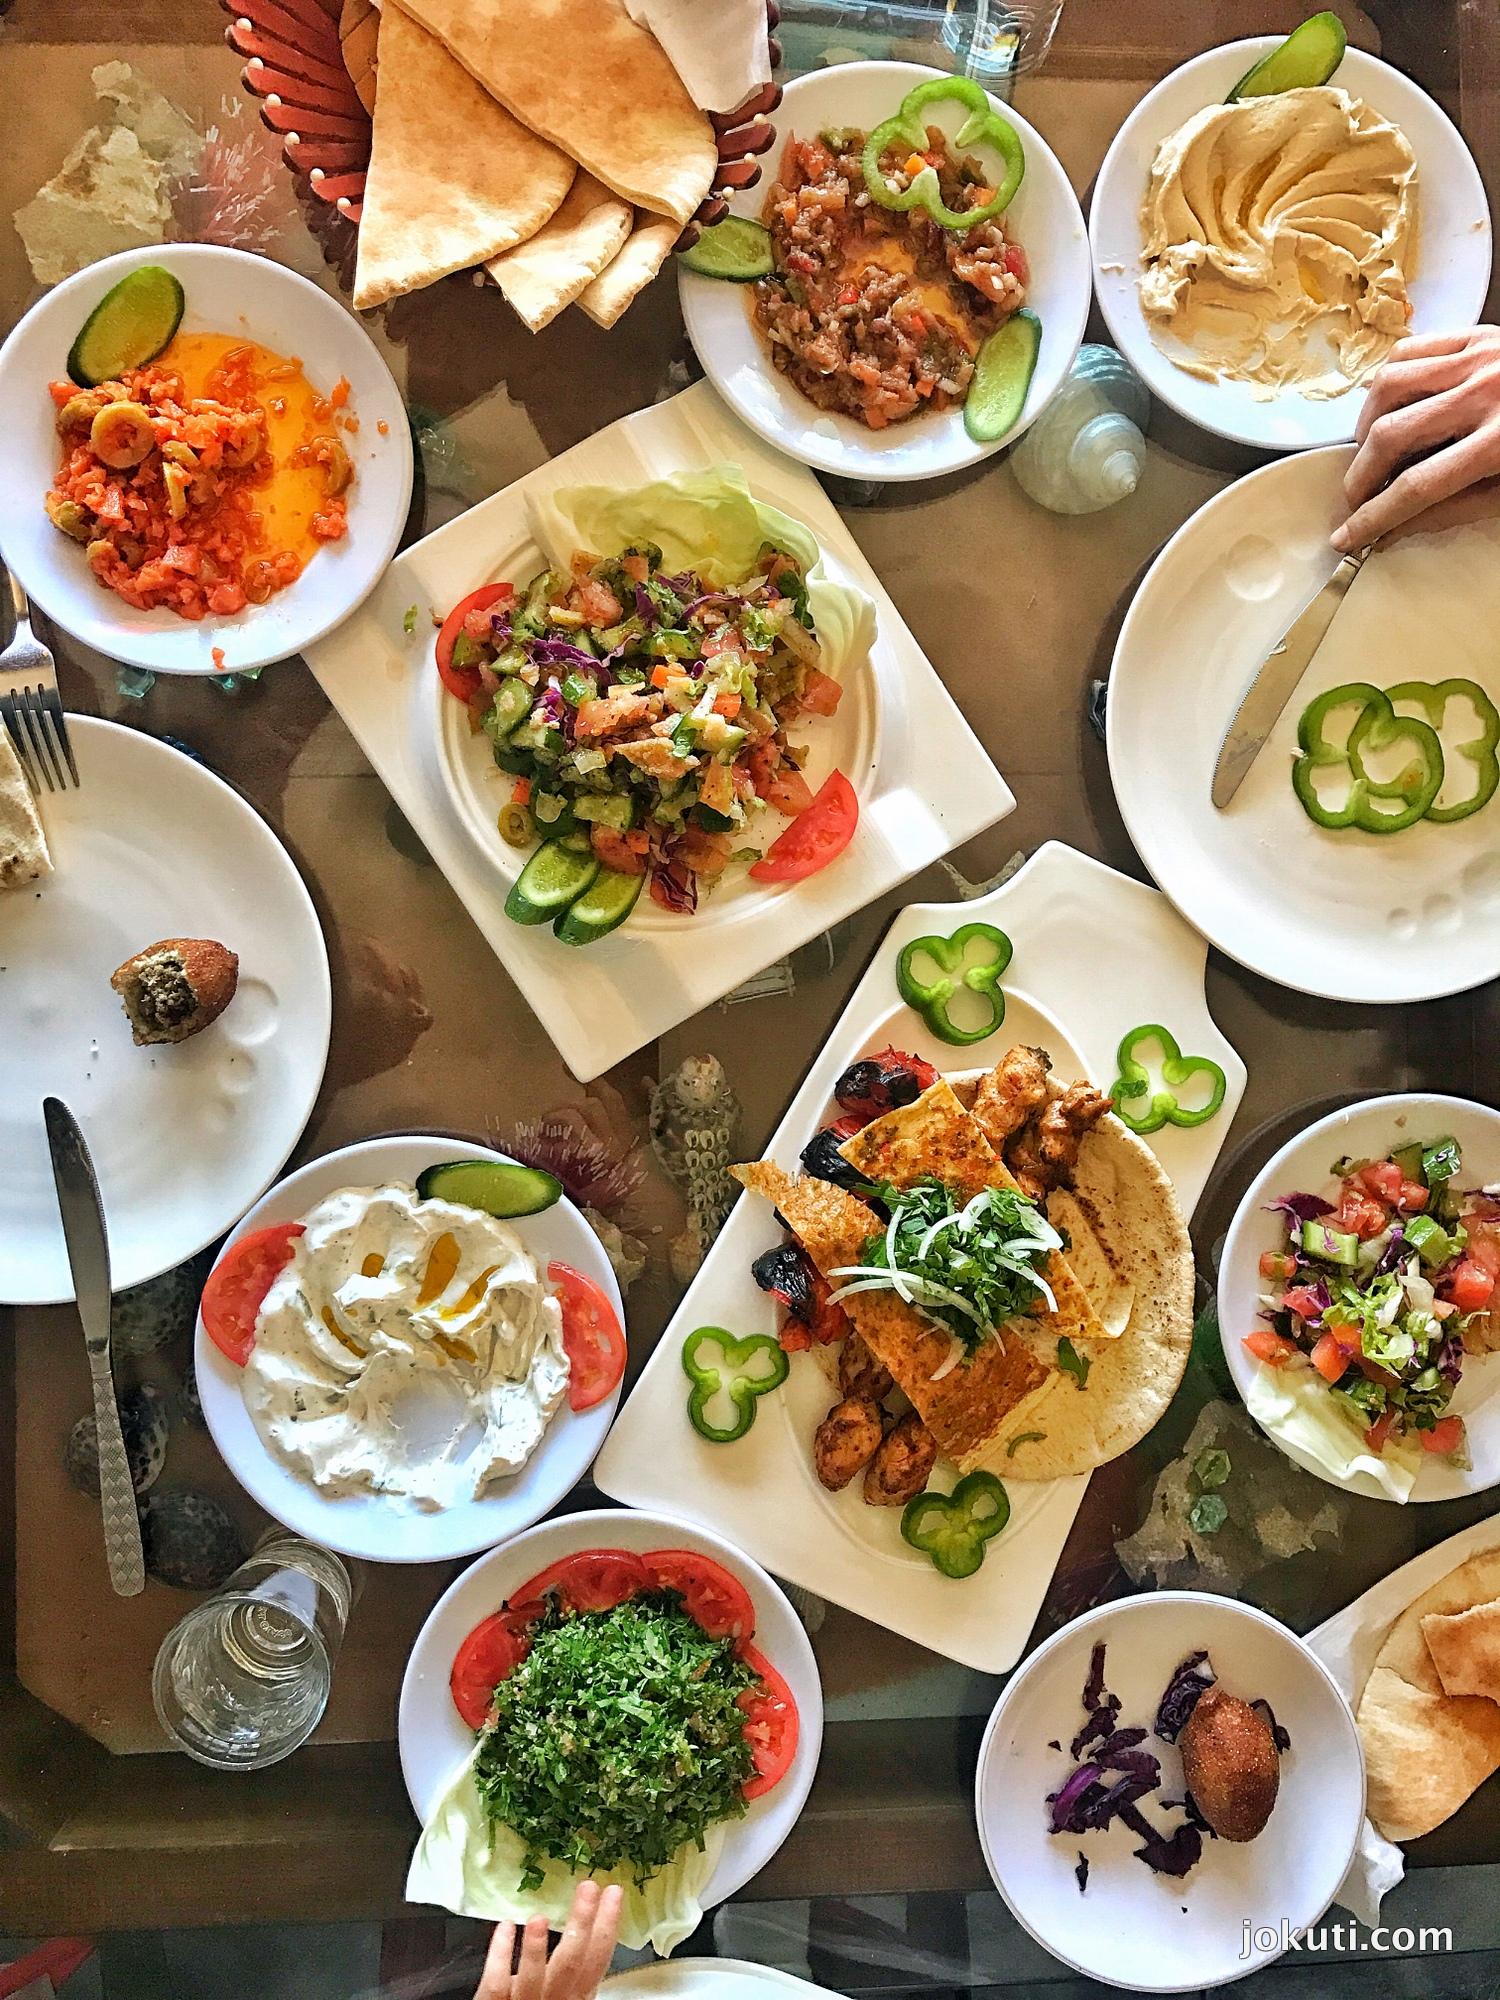 jordan_middleeast_kozelkelet_jokuti_vilagevo_mezze_food_chickpea_10.jpg